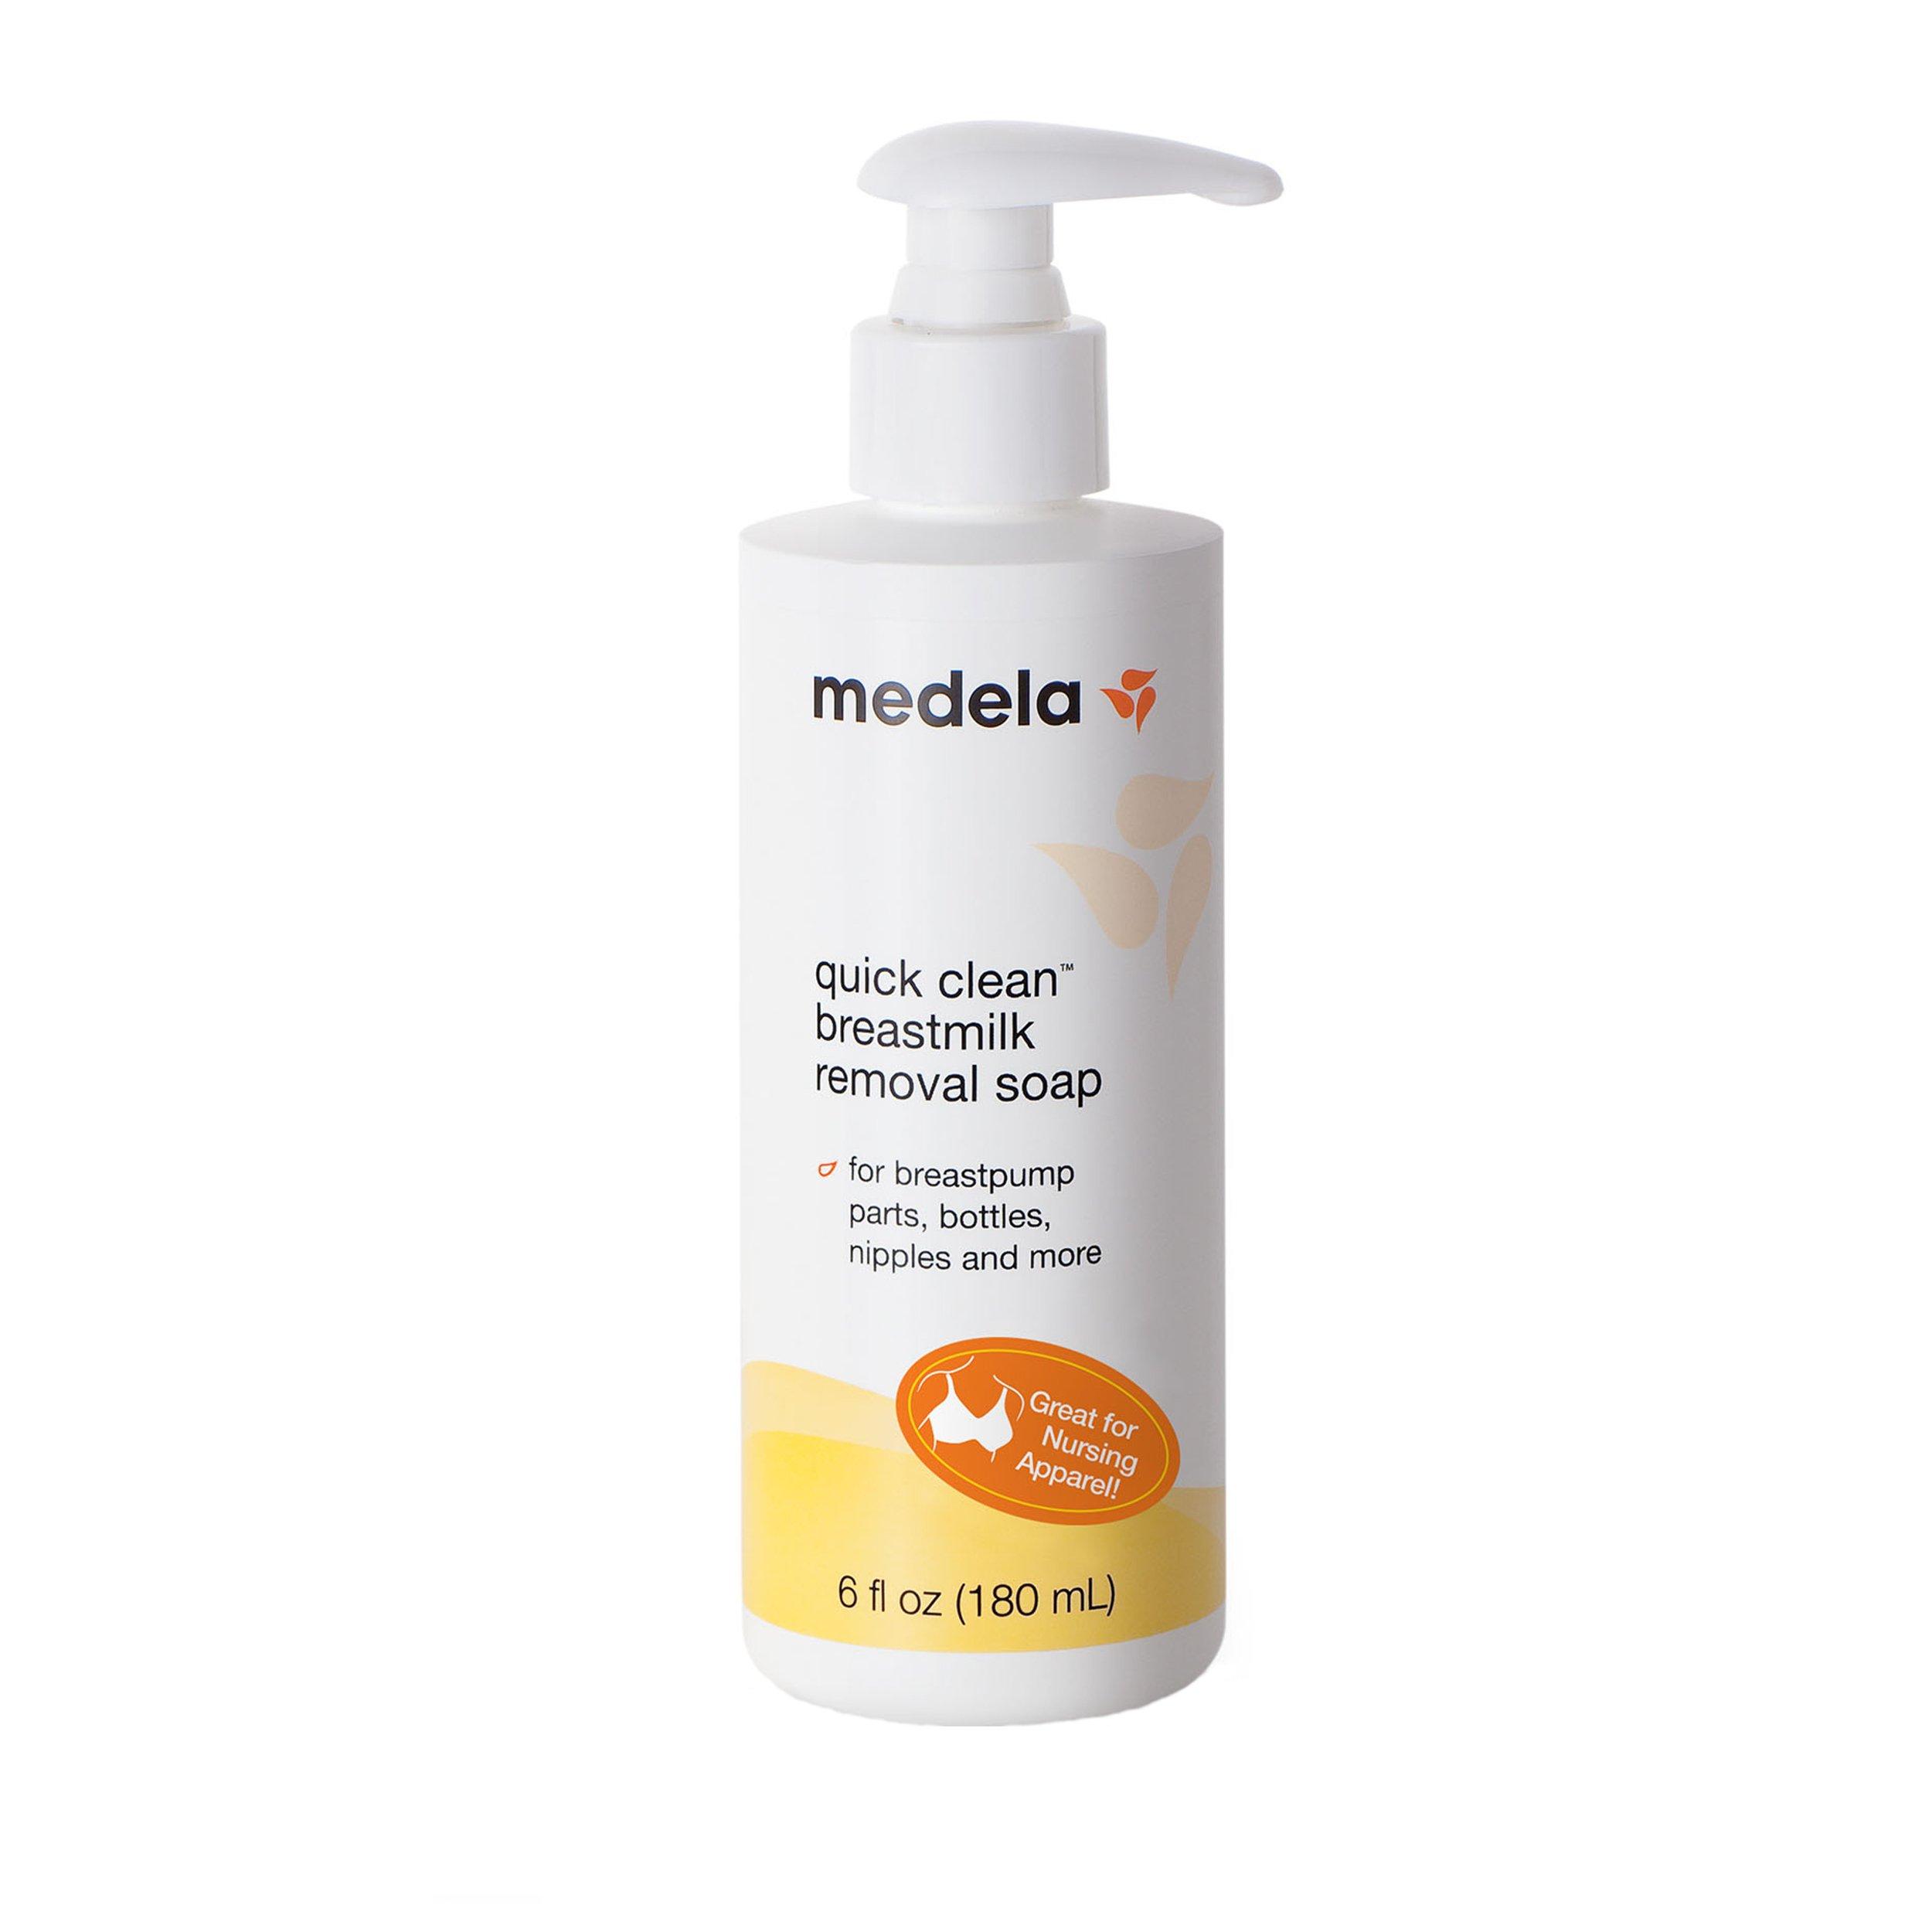 Amazoncom  Medela Milk Storage Guidelines Magnet - 1 -9507